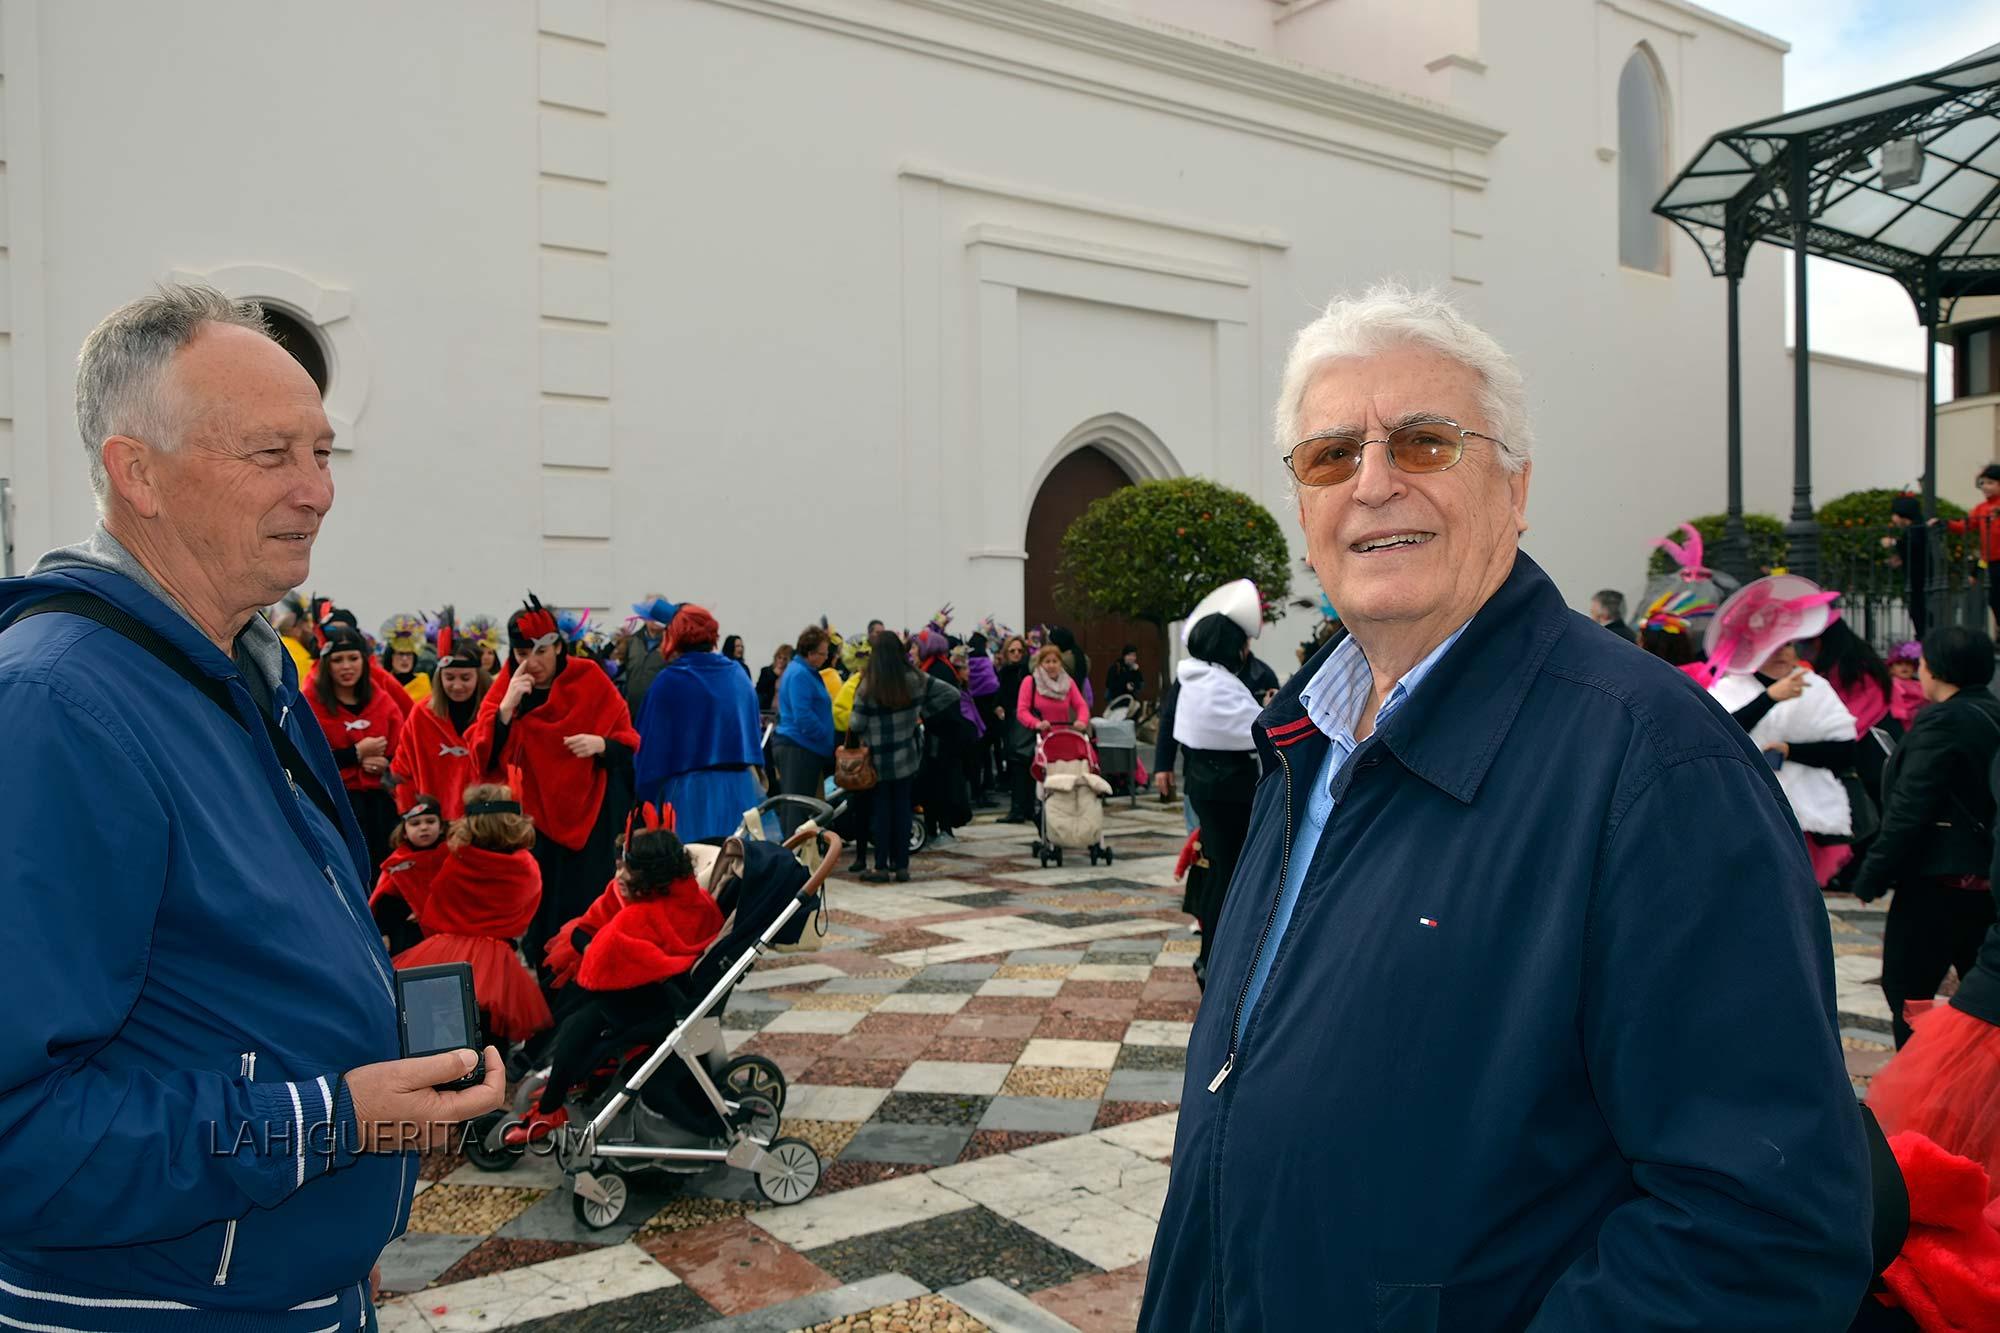 Cabalgata infantil de viudas carnaval de Isla cristina 2016 _DSC1821